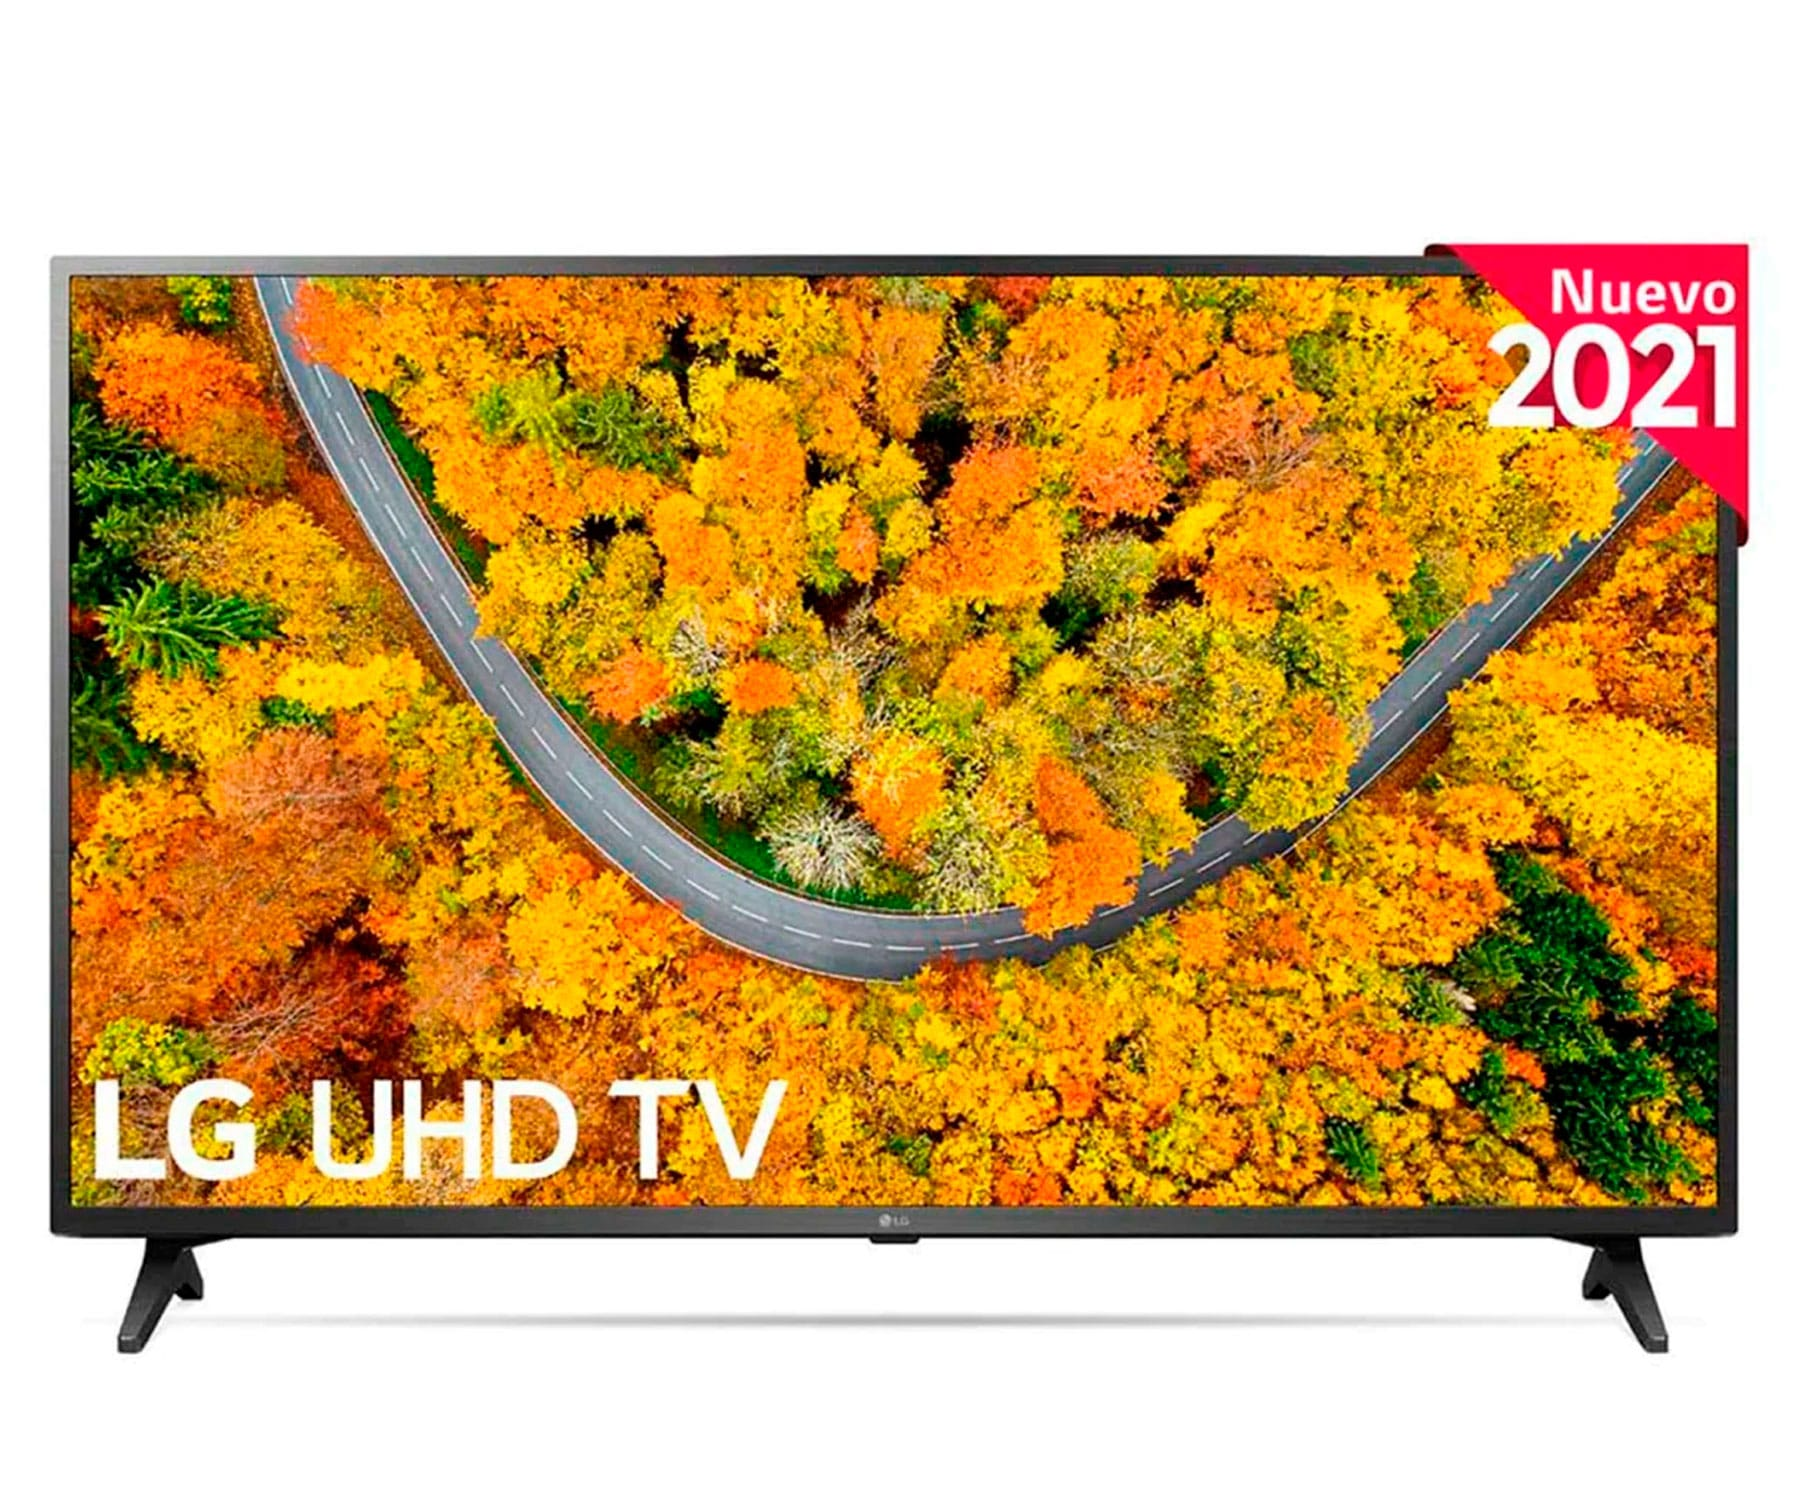 LG 43UP75006LF TELEVISOR SMART TV 43'' UHD 4K HDR